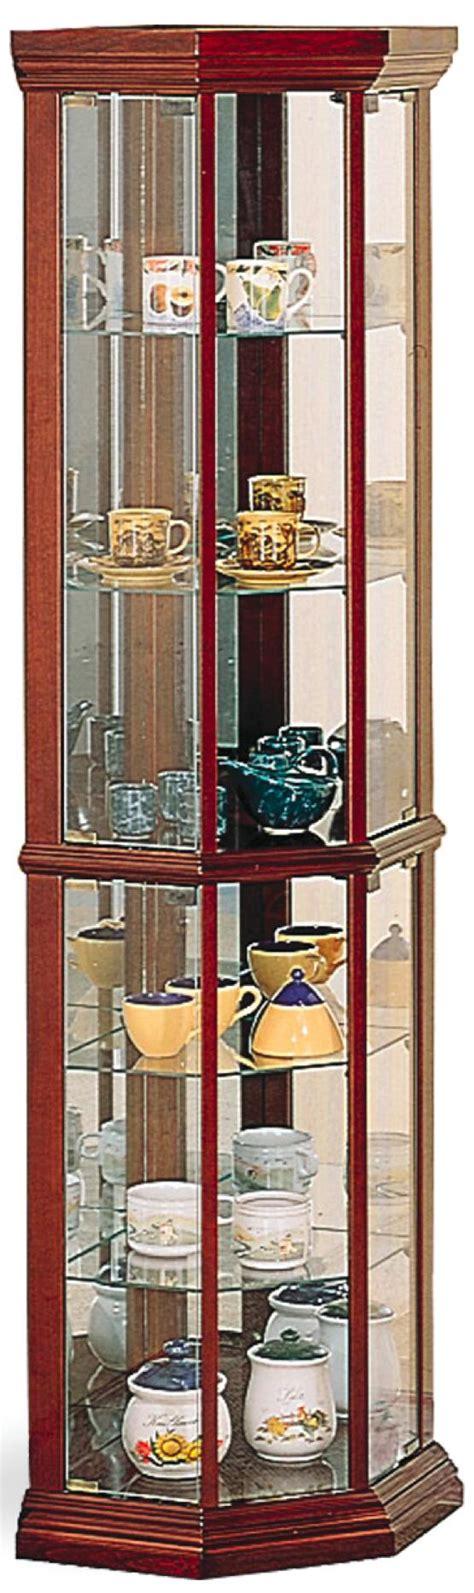 value city furniture curio cabinets coaster curio cabinets solid wood cherry glass corner